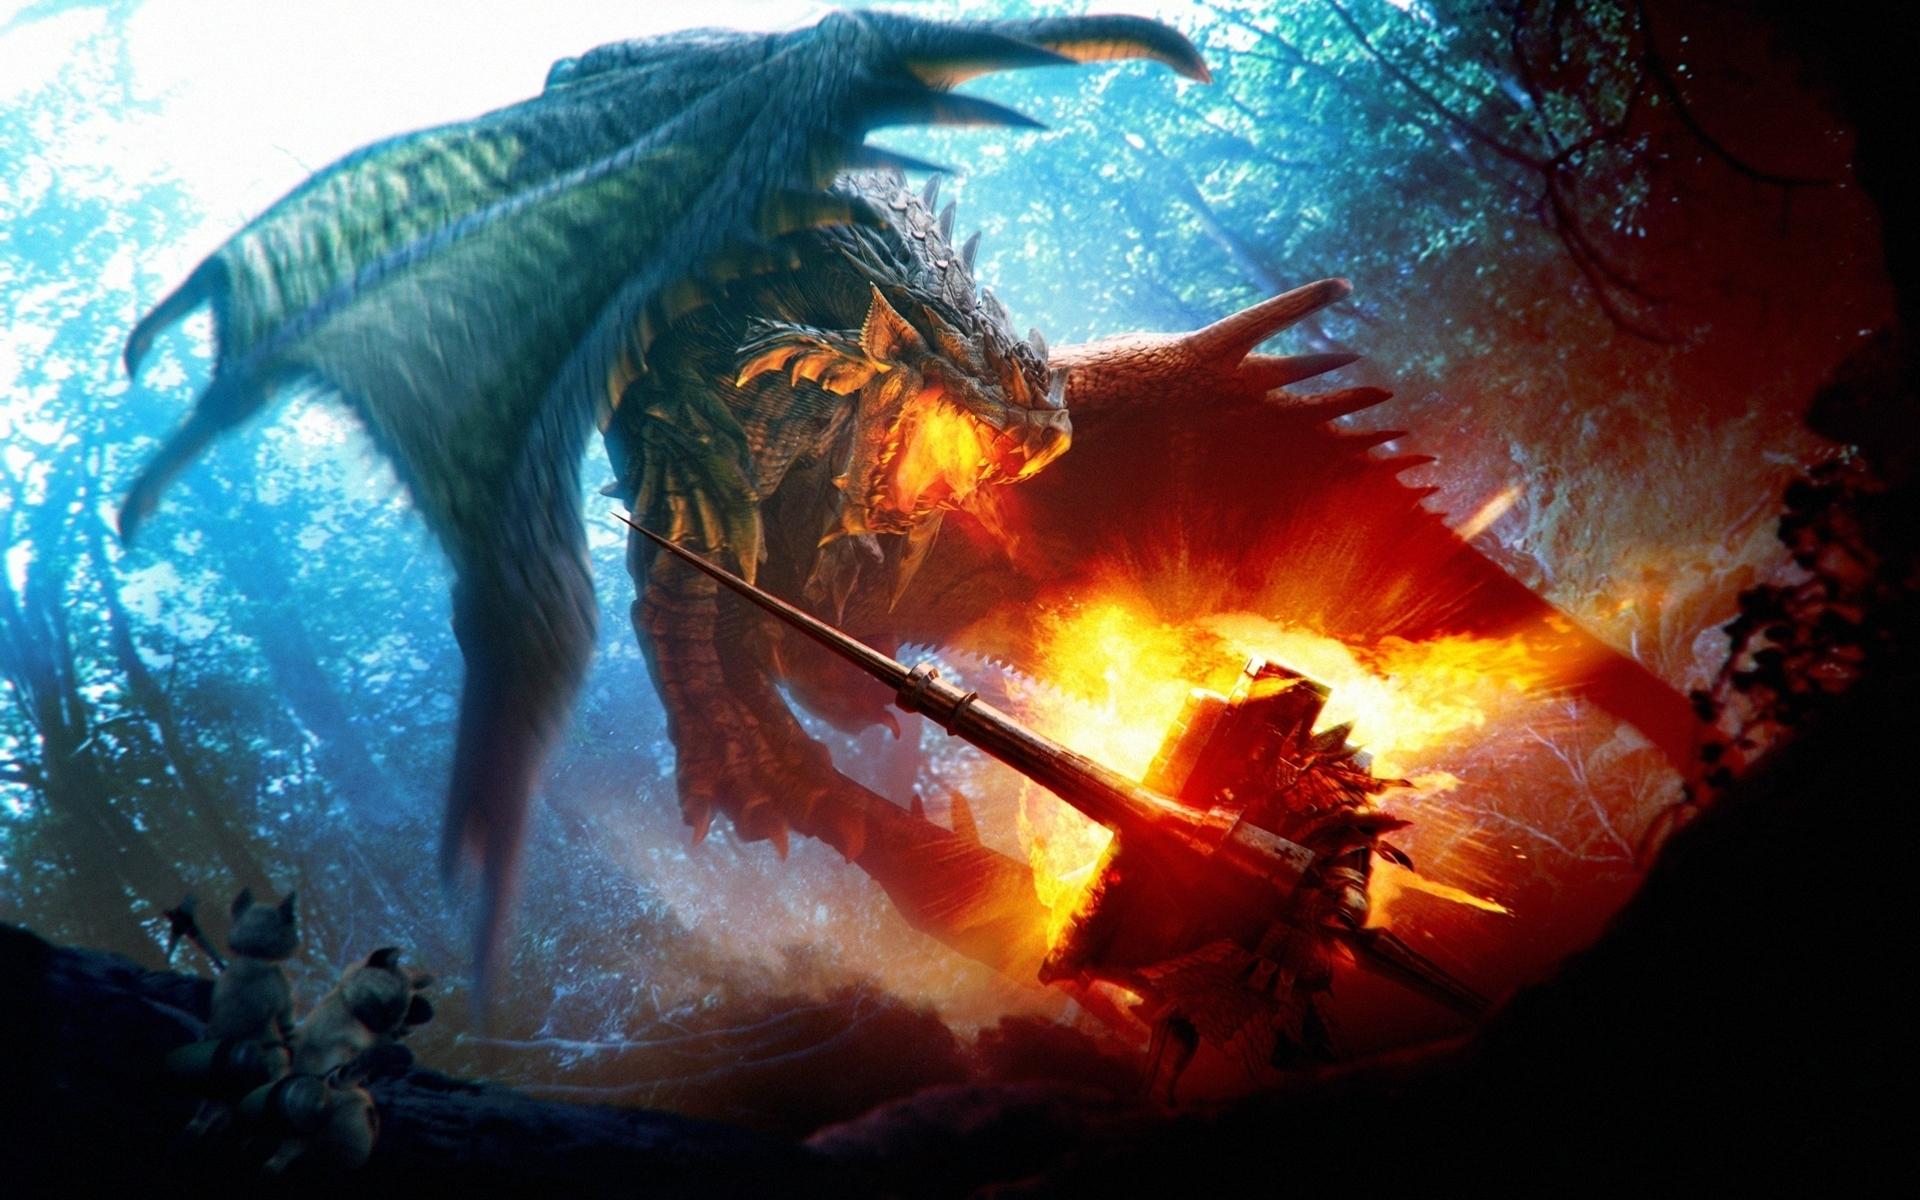 wallpaper : fight, dragon, fire, board, wood 1920x1200 - - 1105907